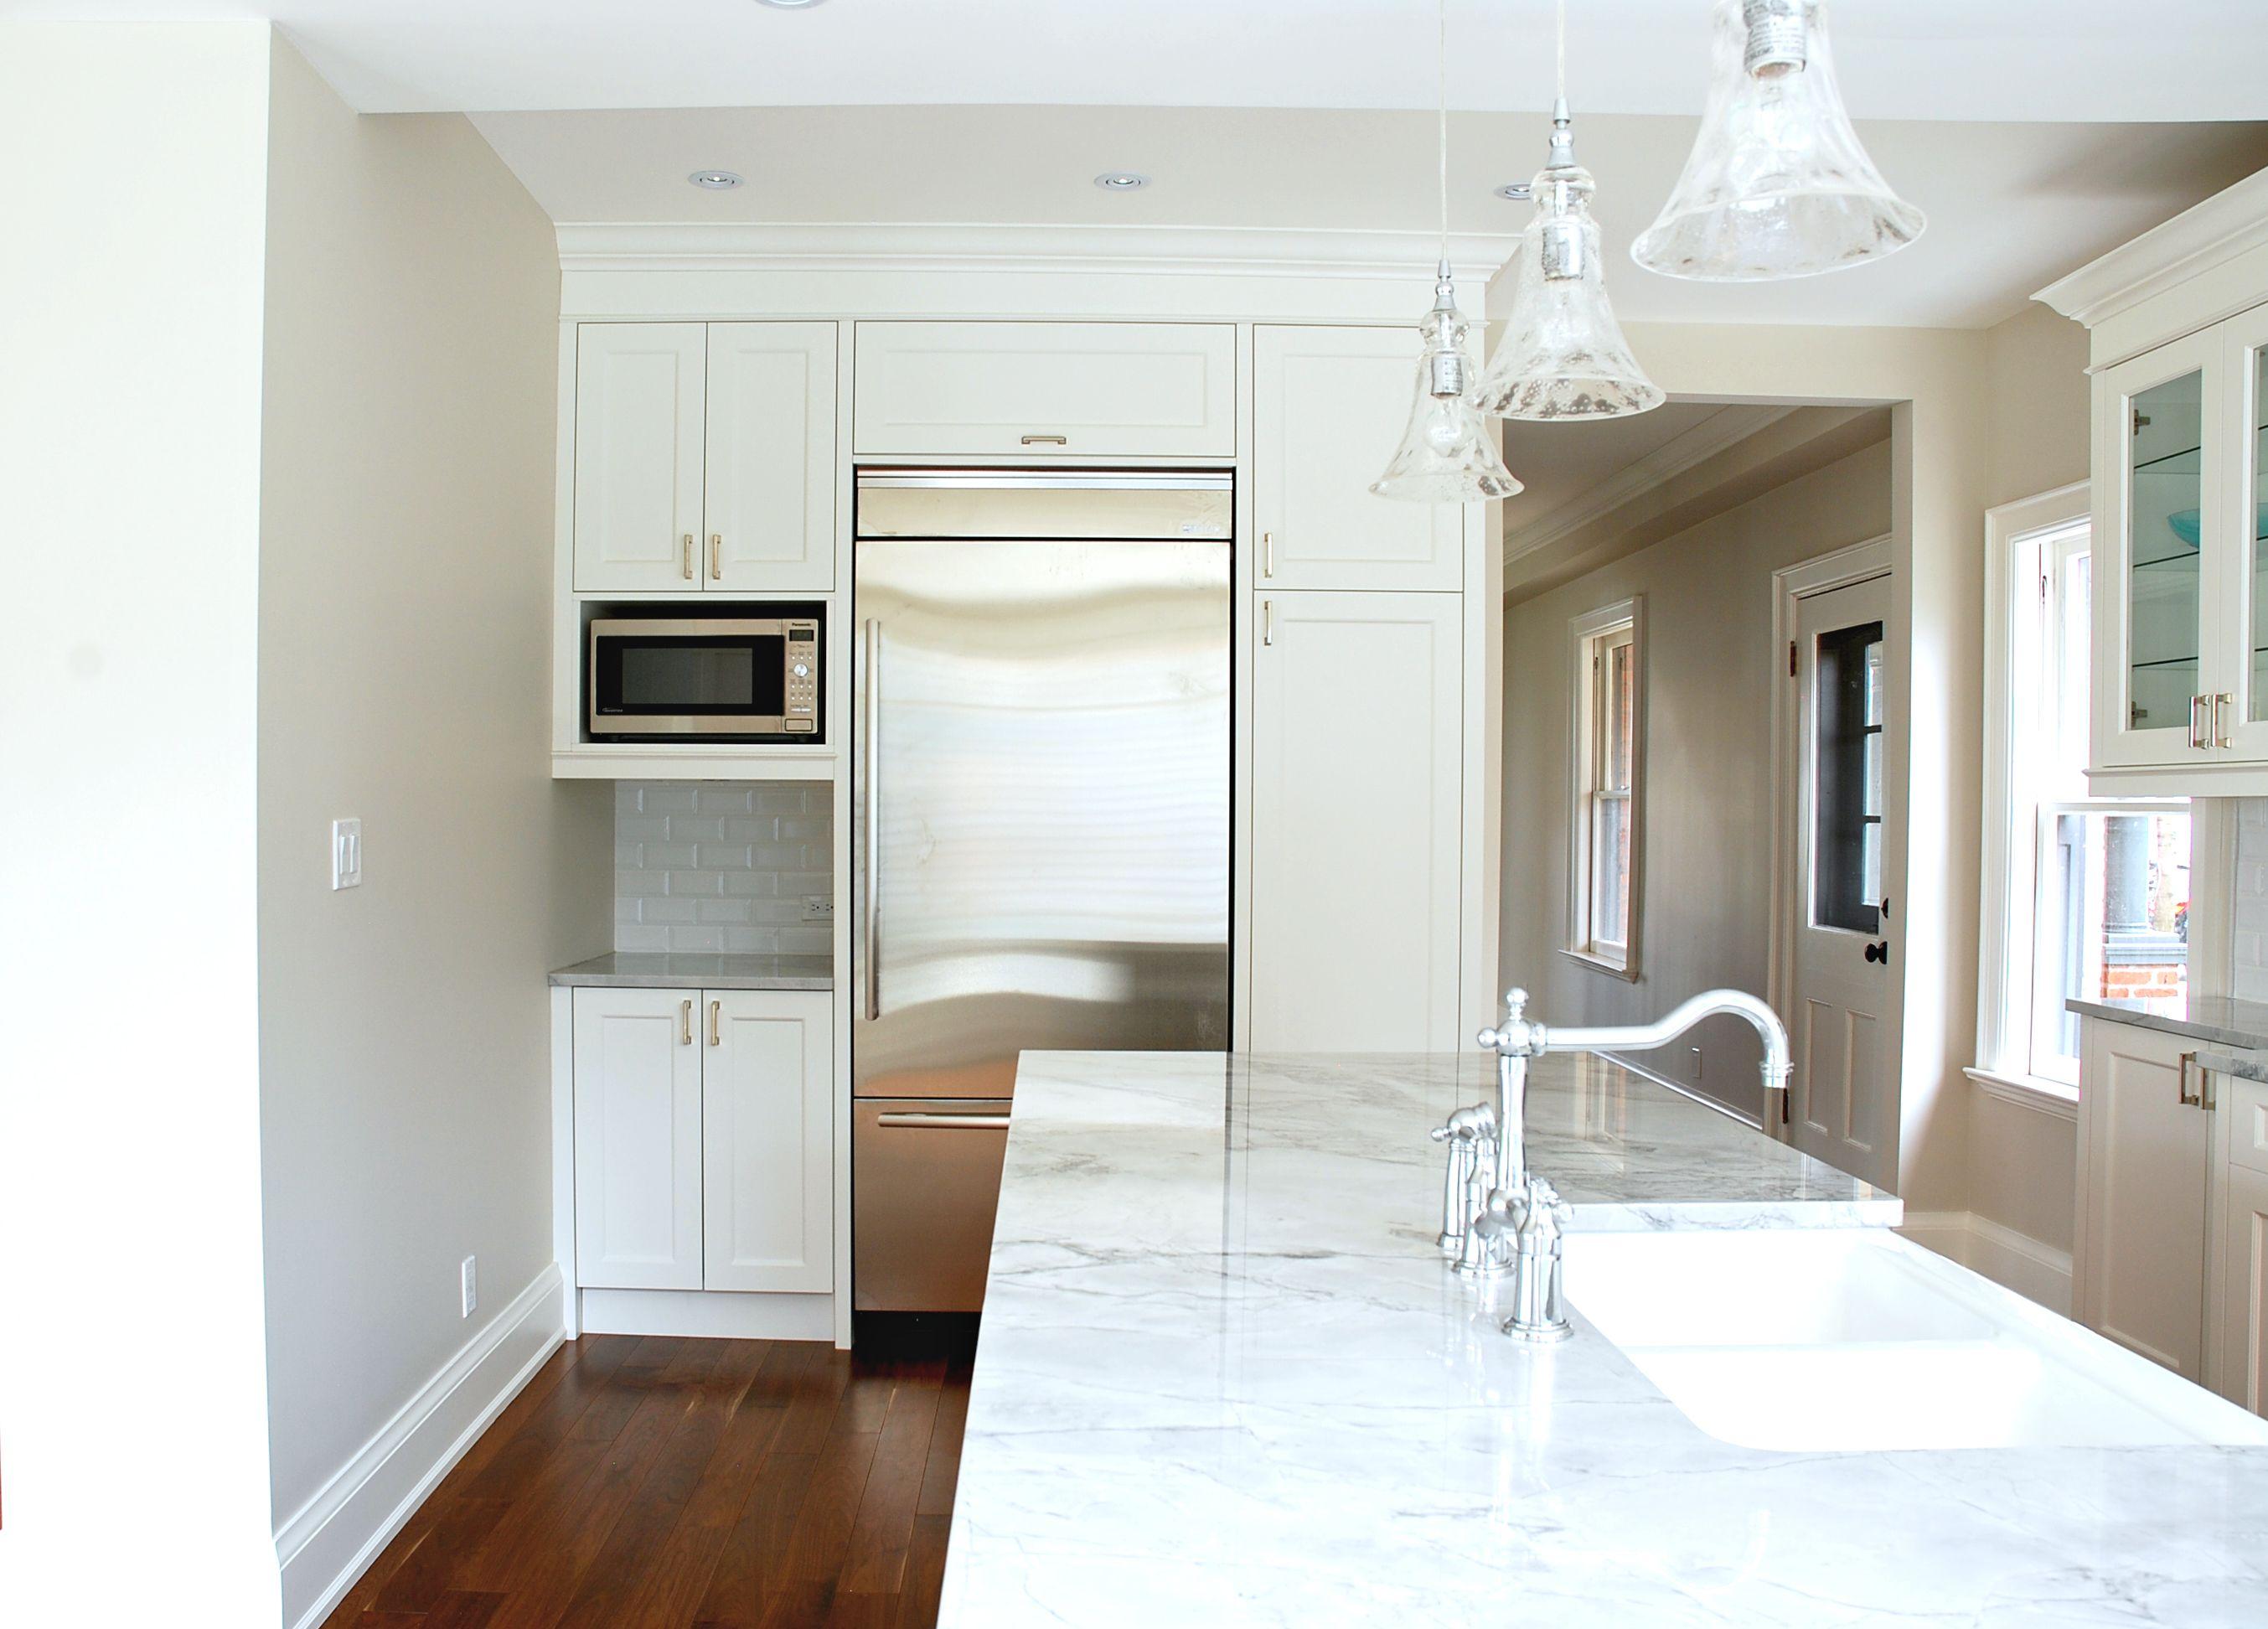 Silverlining Designs  Interior Design And Textile Design In Mississauga,